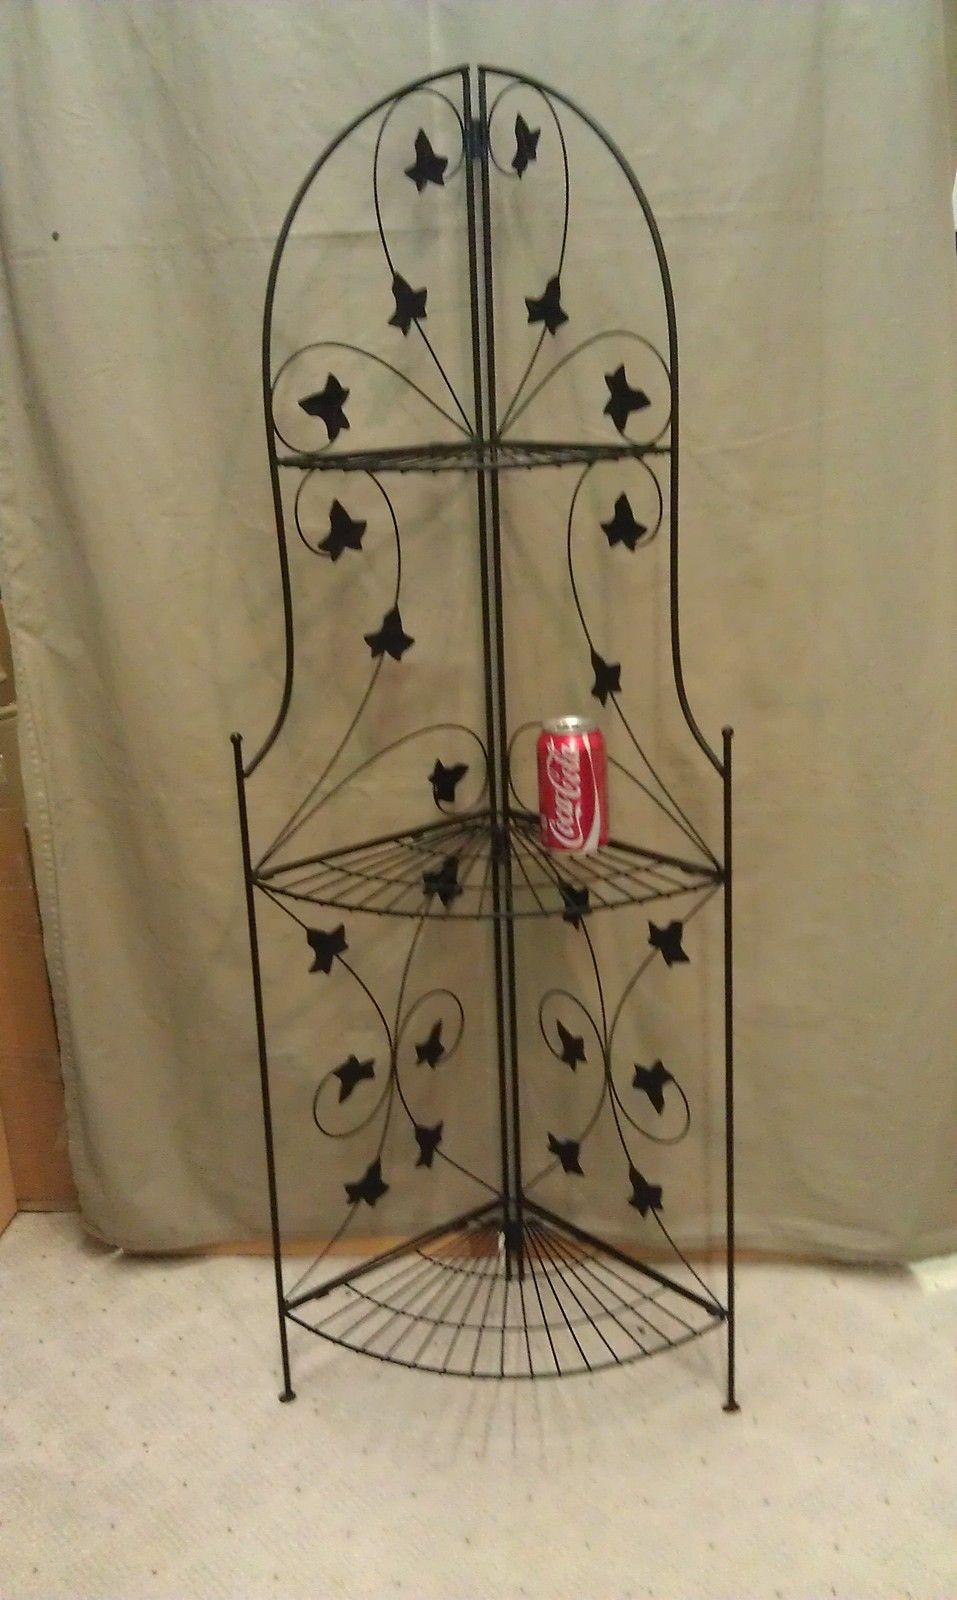 9k11 black wrought iron 3 tiered corner shelf 50 tall. Black Bedroom Furniture Sets. Home Design Ideas